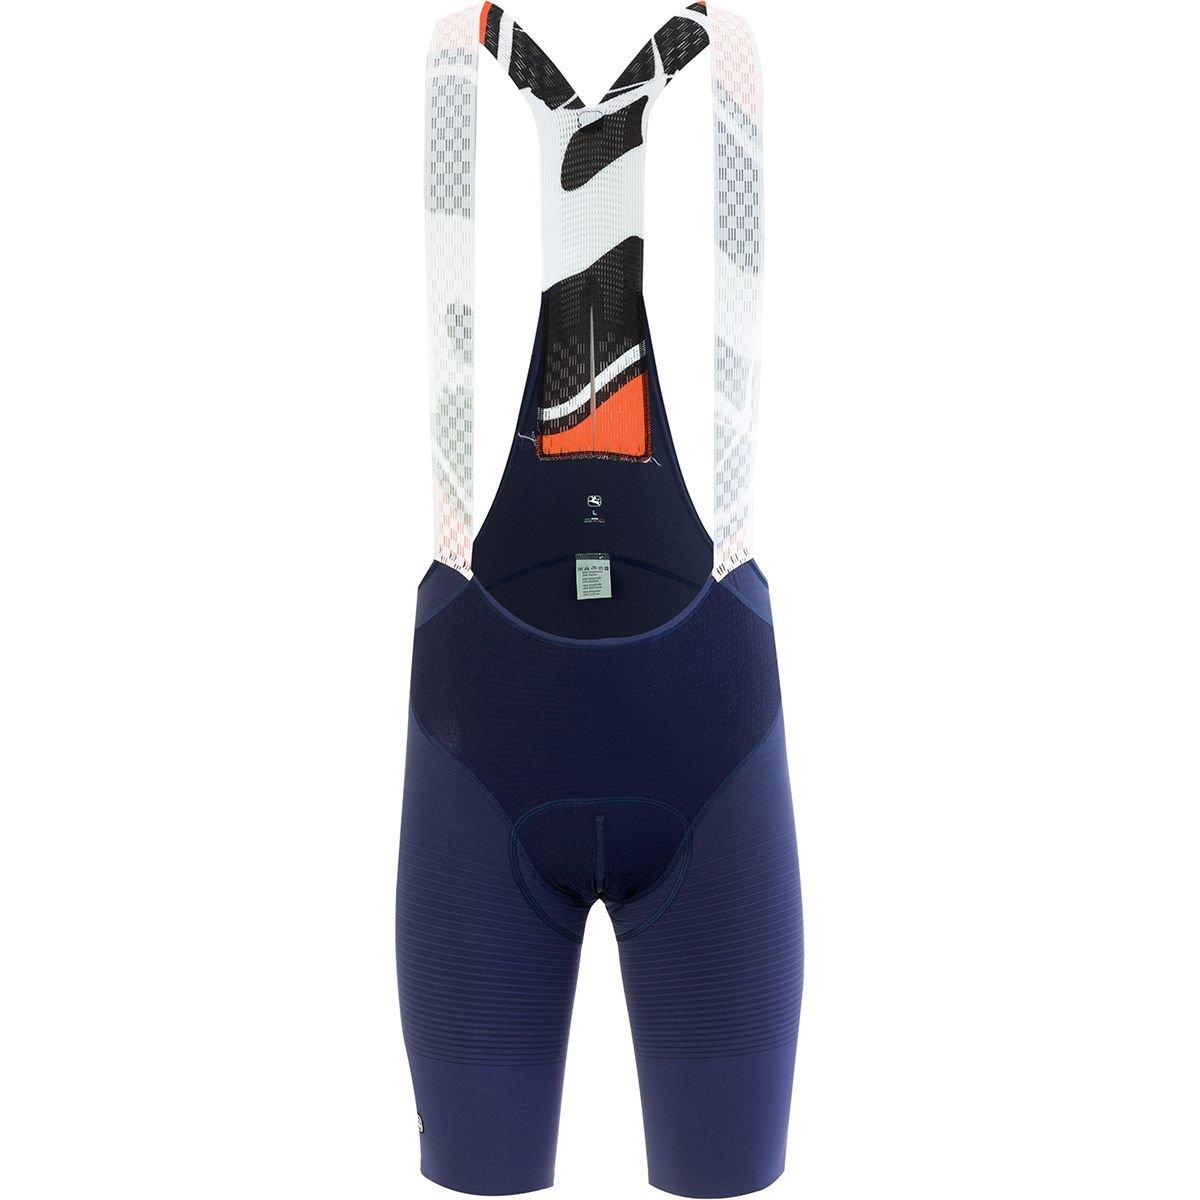 Giordana NX-G Bib Shorts with Cirro-S Insert - Men's Navy, S